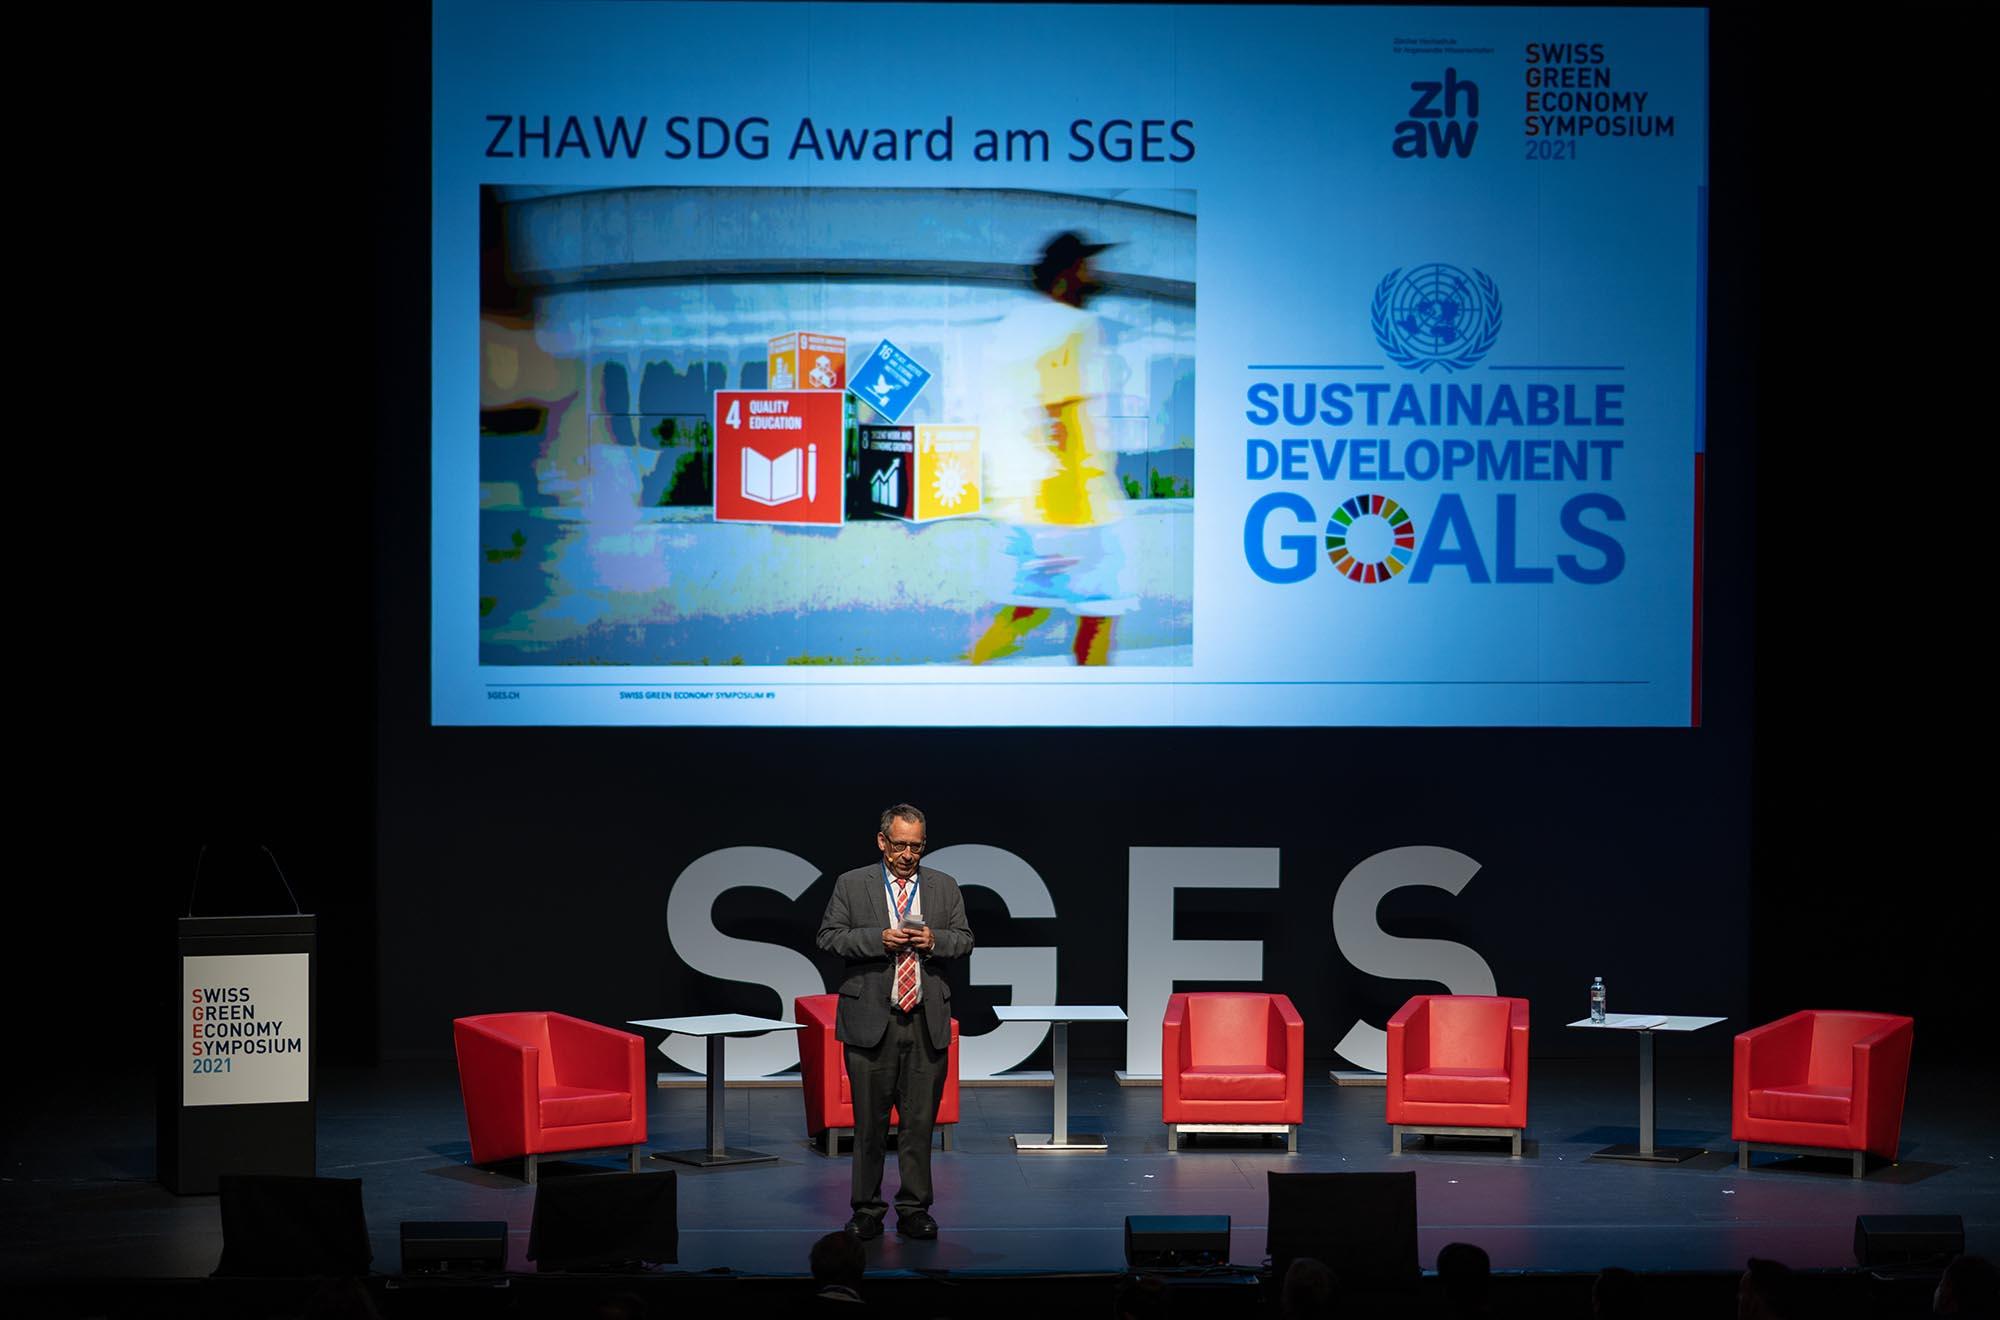 SGES SDG Award: Prof. Dr. Jean-Marc Piveteau, Rektor ZHAW